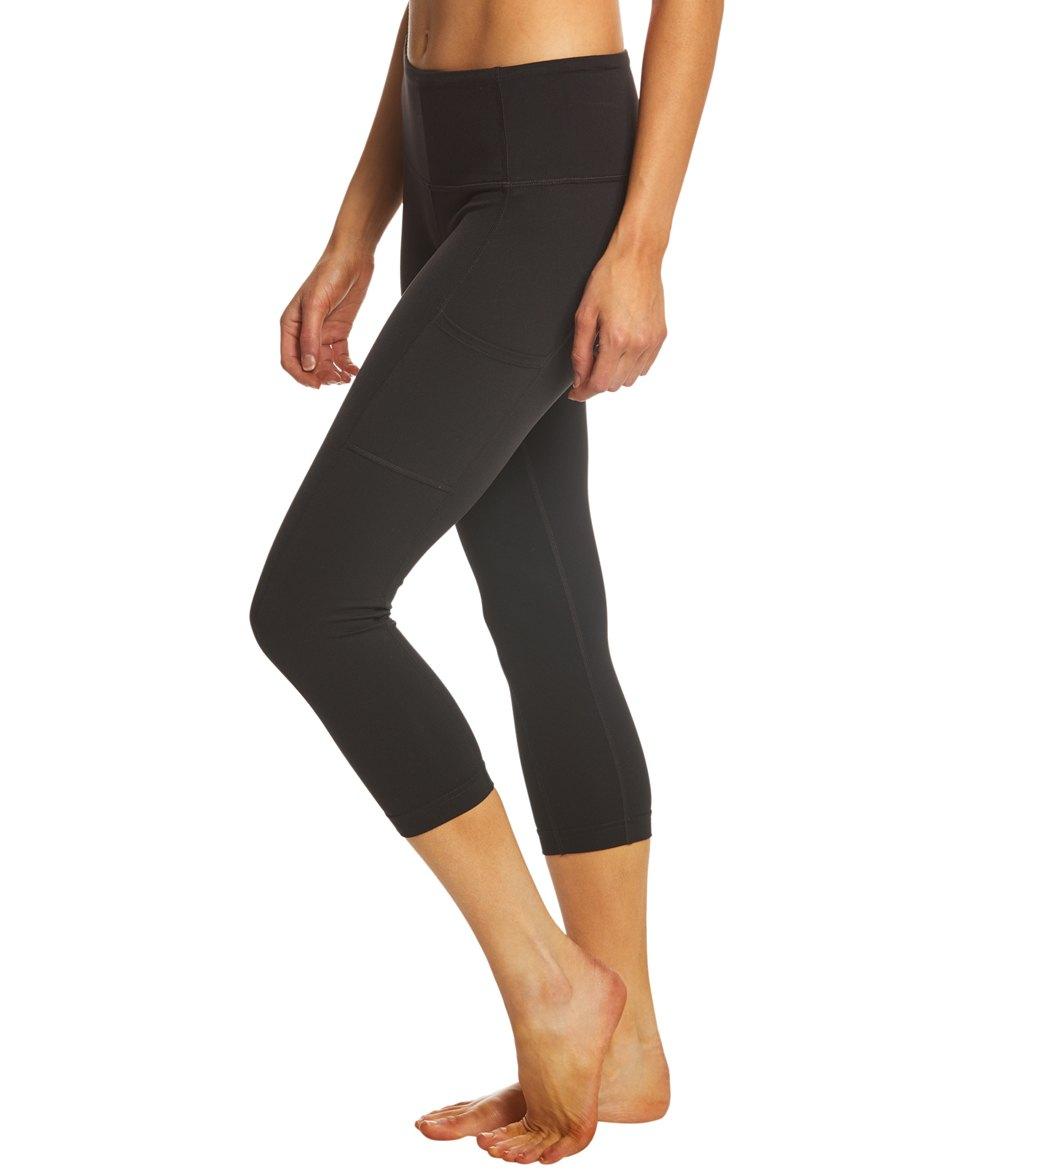 prAna Womens Borra Pocket Capri Prana Sports Apparel W41180319-P